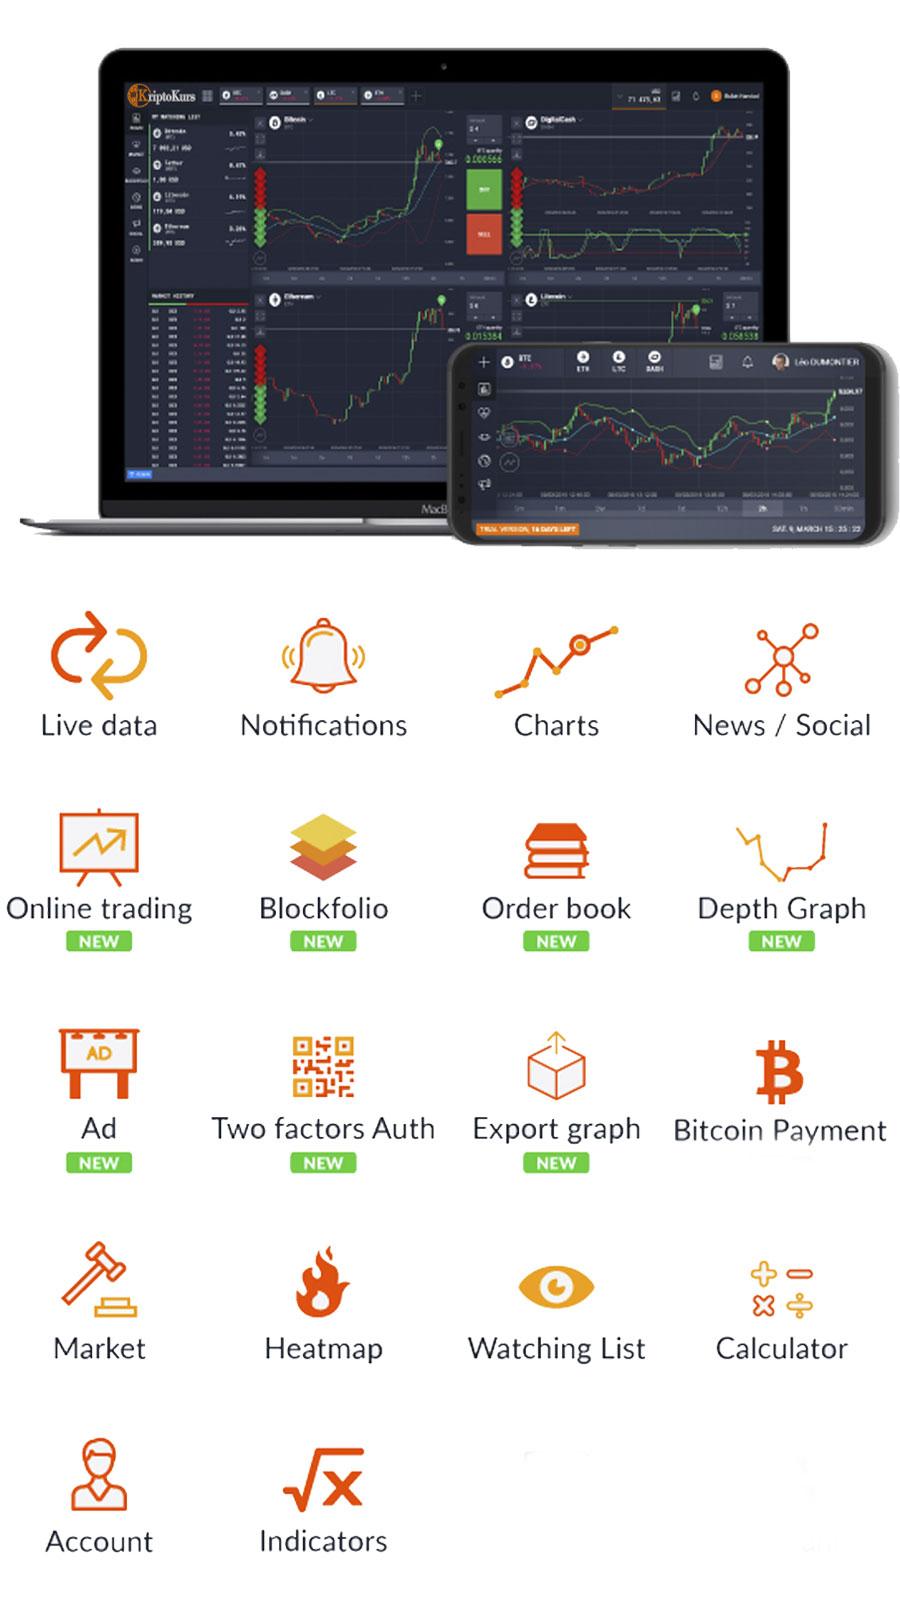 TradeTool-инструменты-для-криптотрейдинга